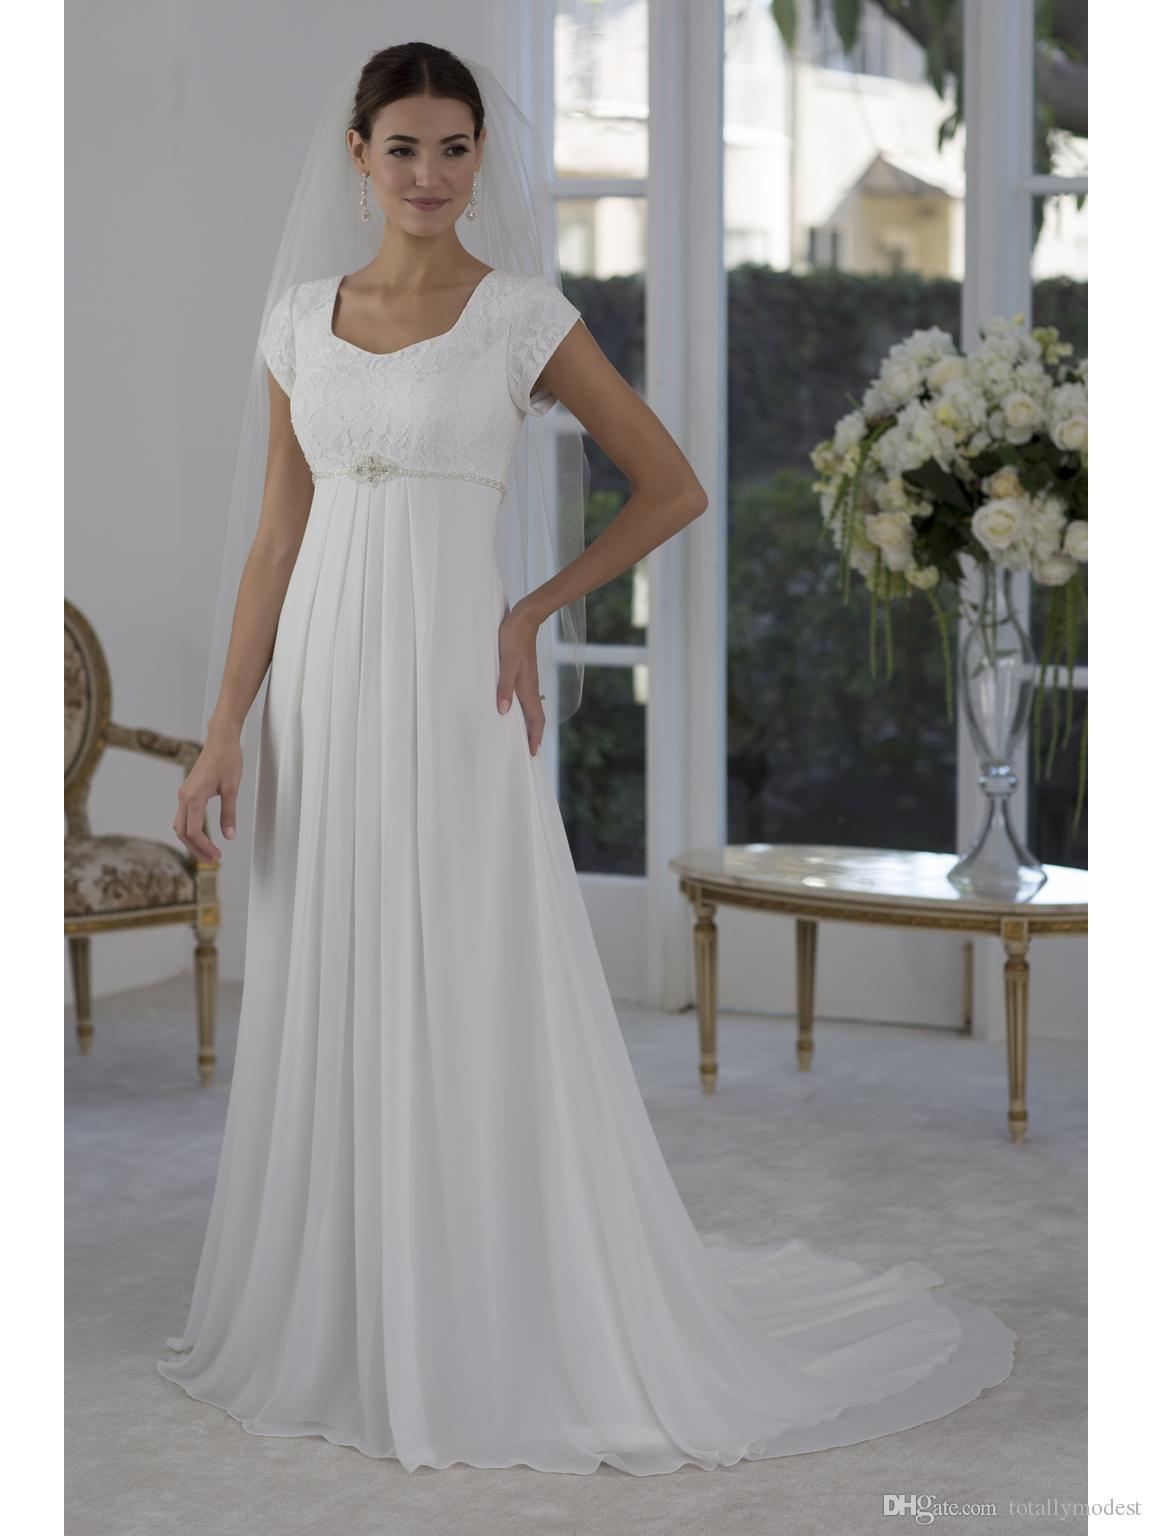 Simple Lace Chiffon Beach Maternity Modest Wedding Dresses